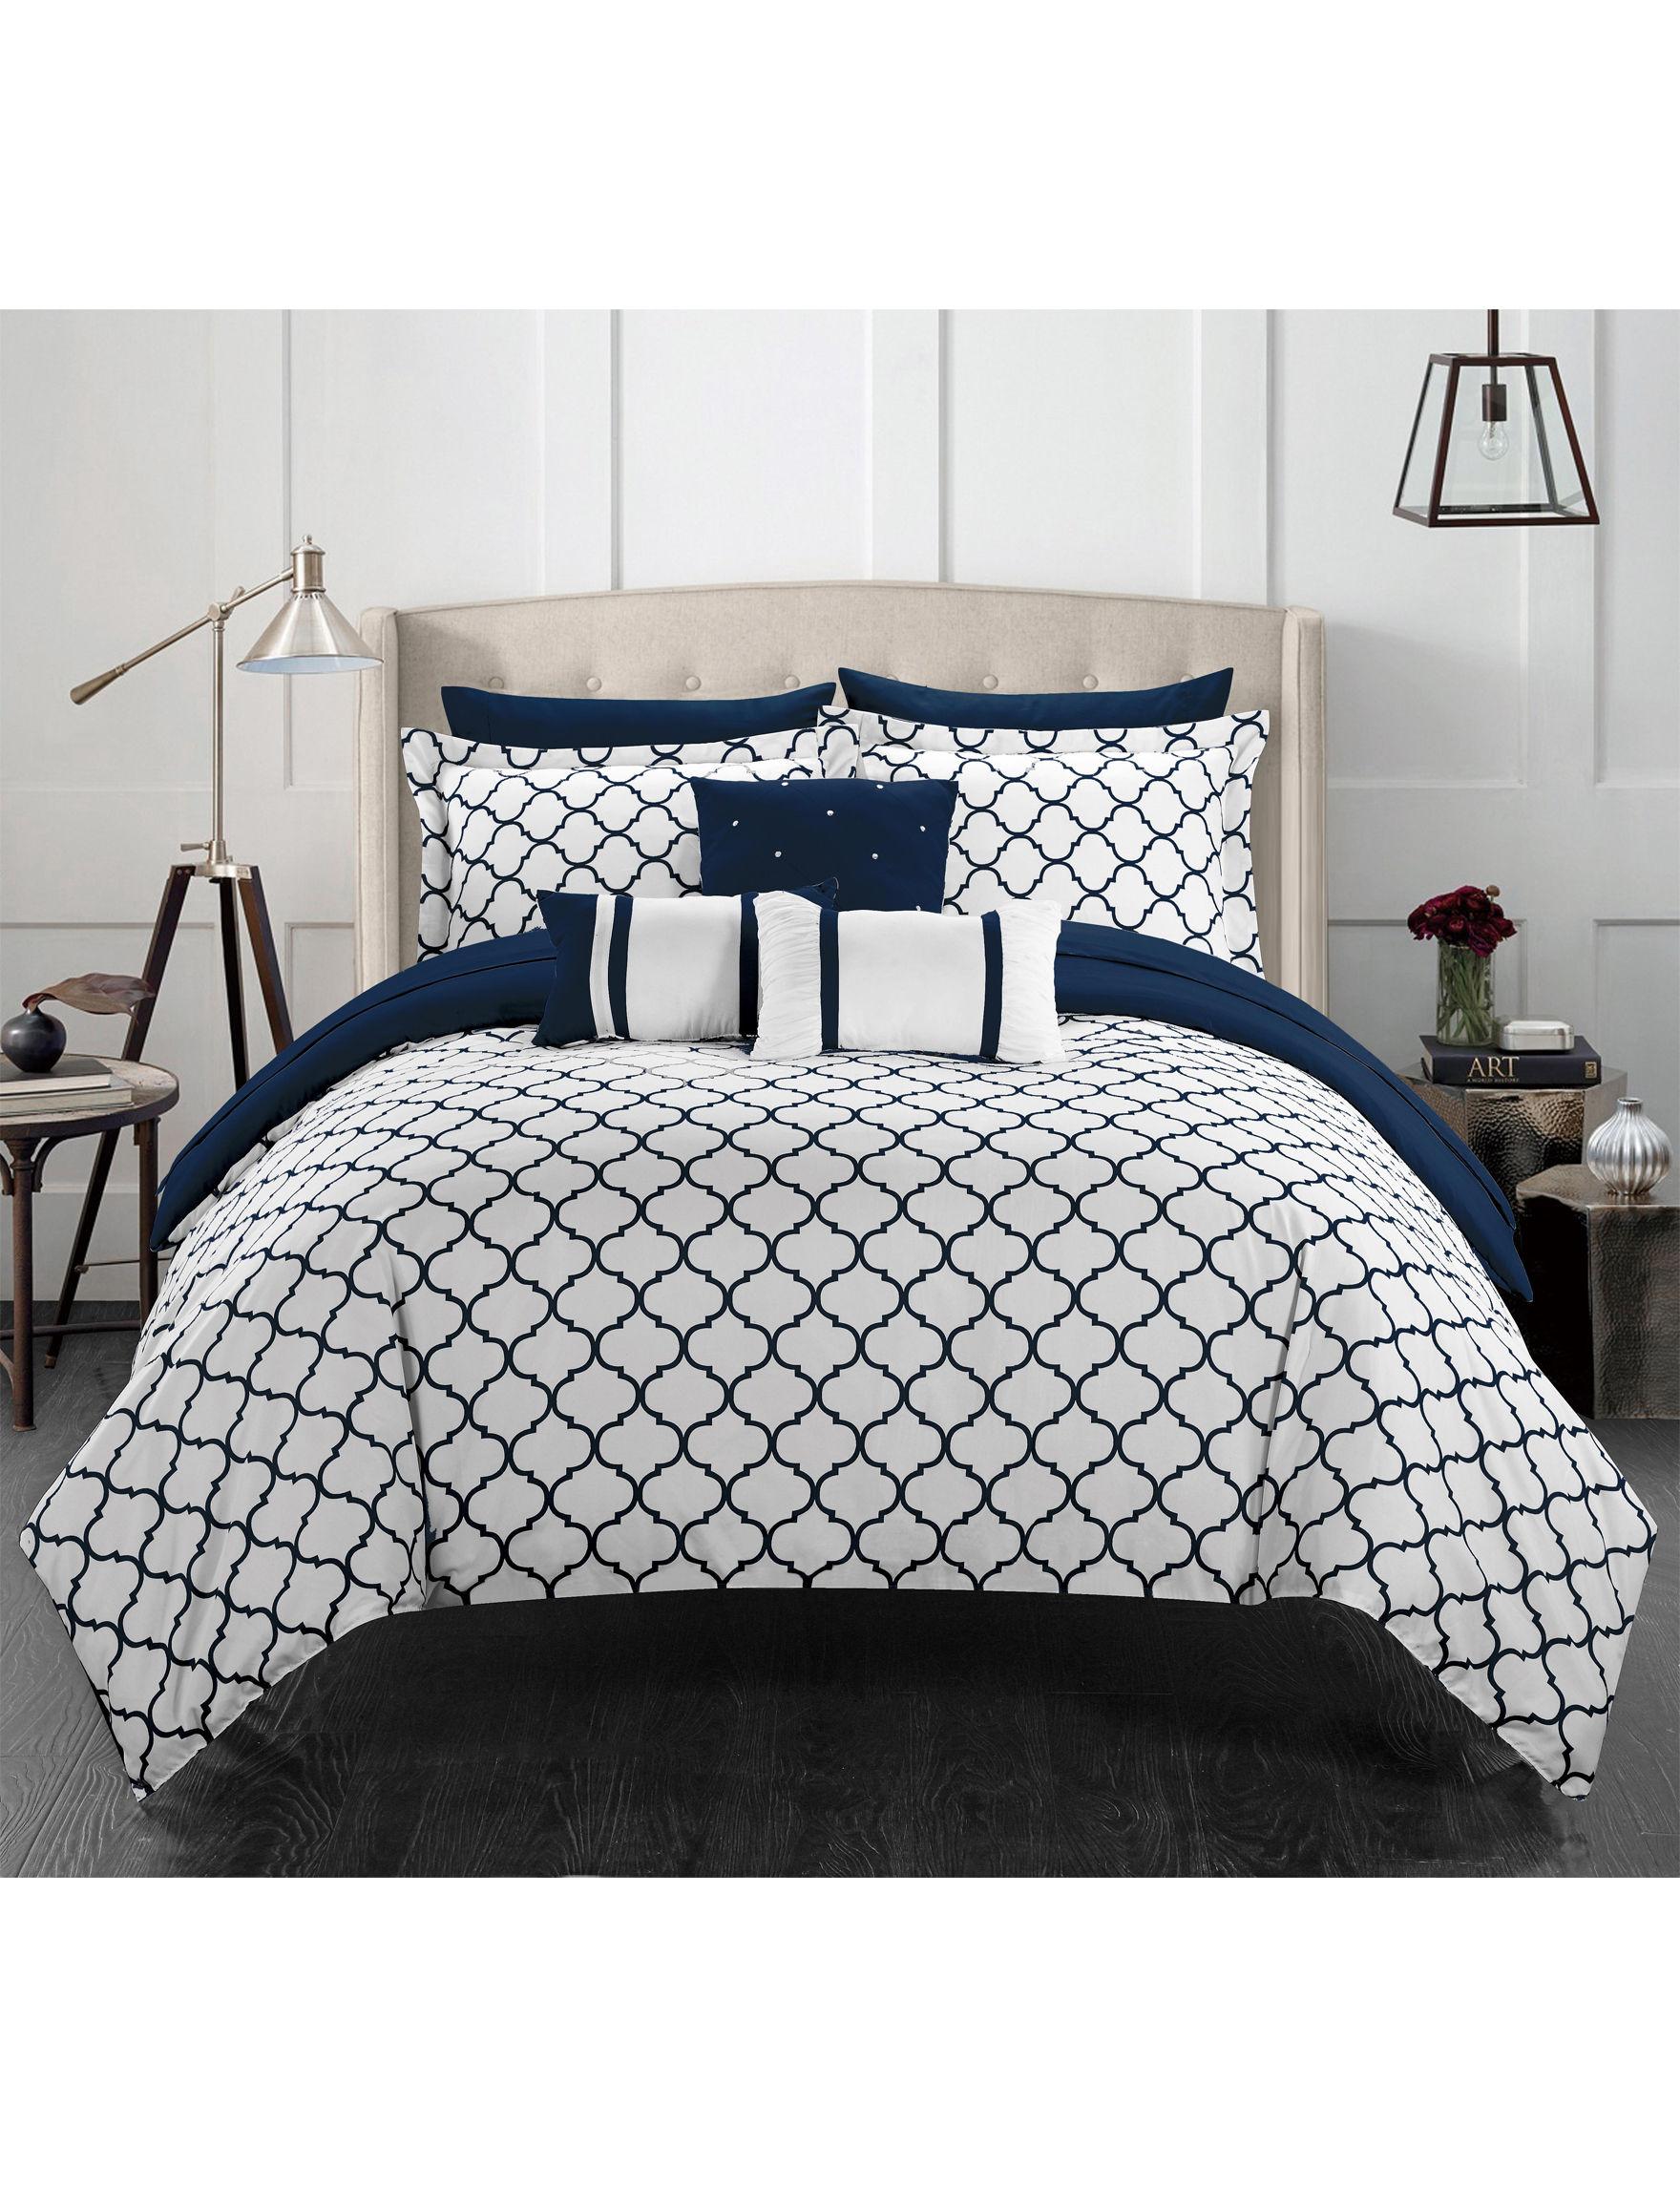 Chic Home Design Navy Comforters & Comforter Sets